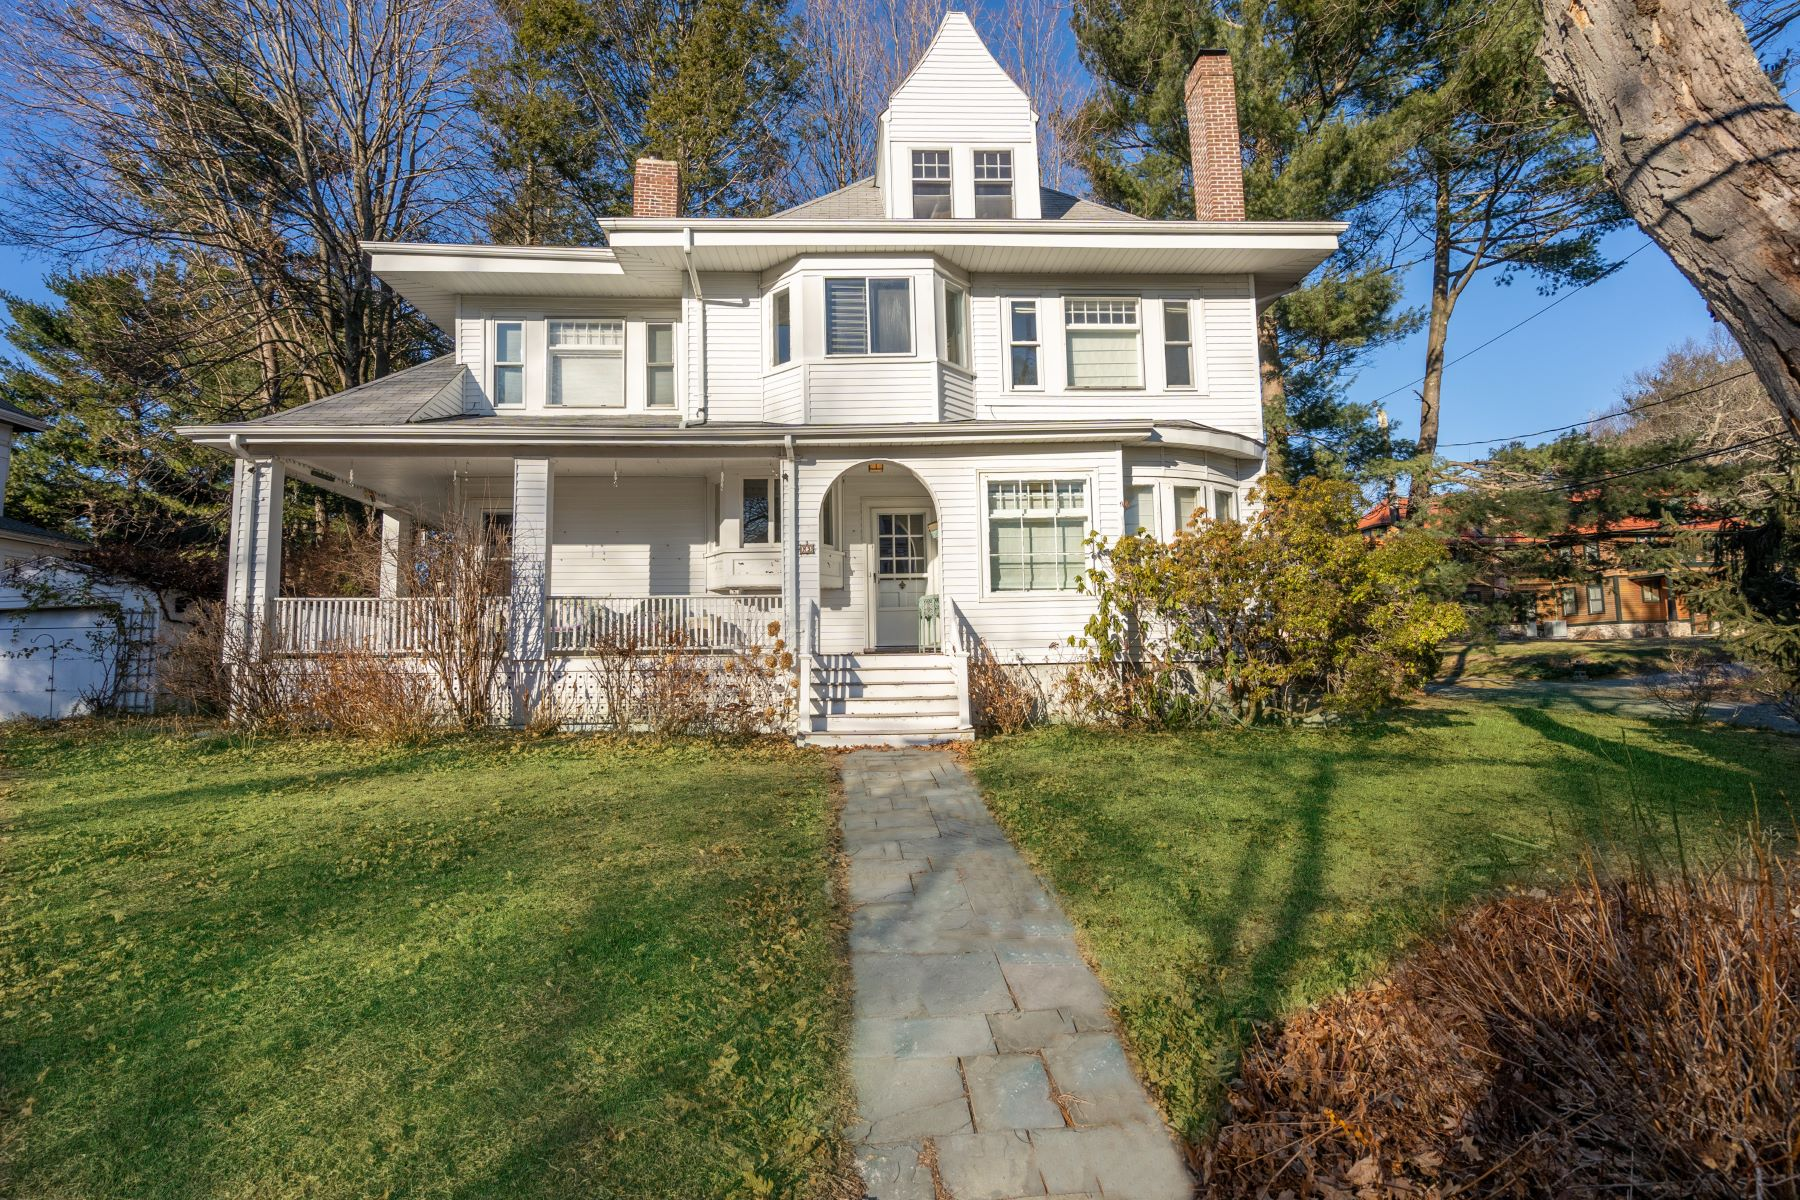 Single Family Homes για την Πώληση στο Newton, Μασαχουσετη 02461 Ηνωμένες Πολιτείες